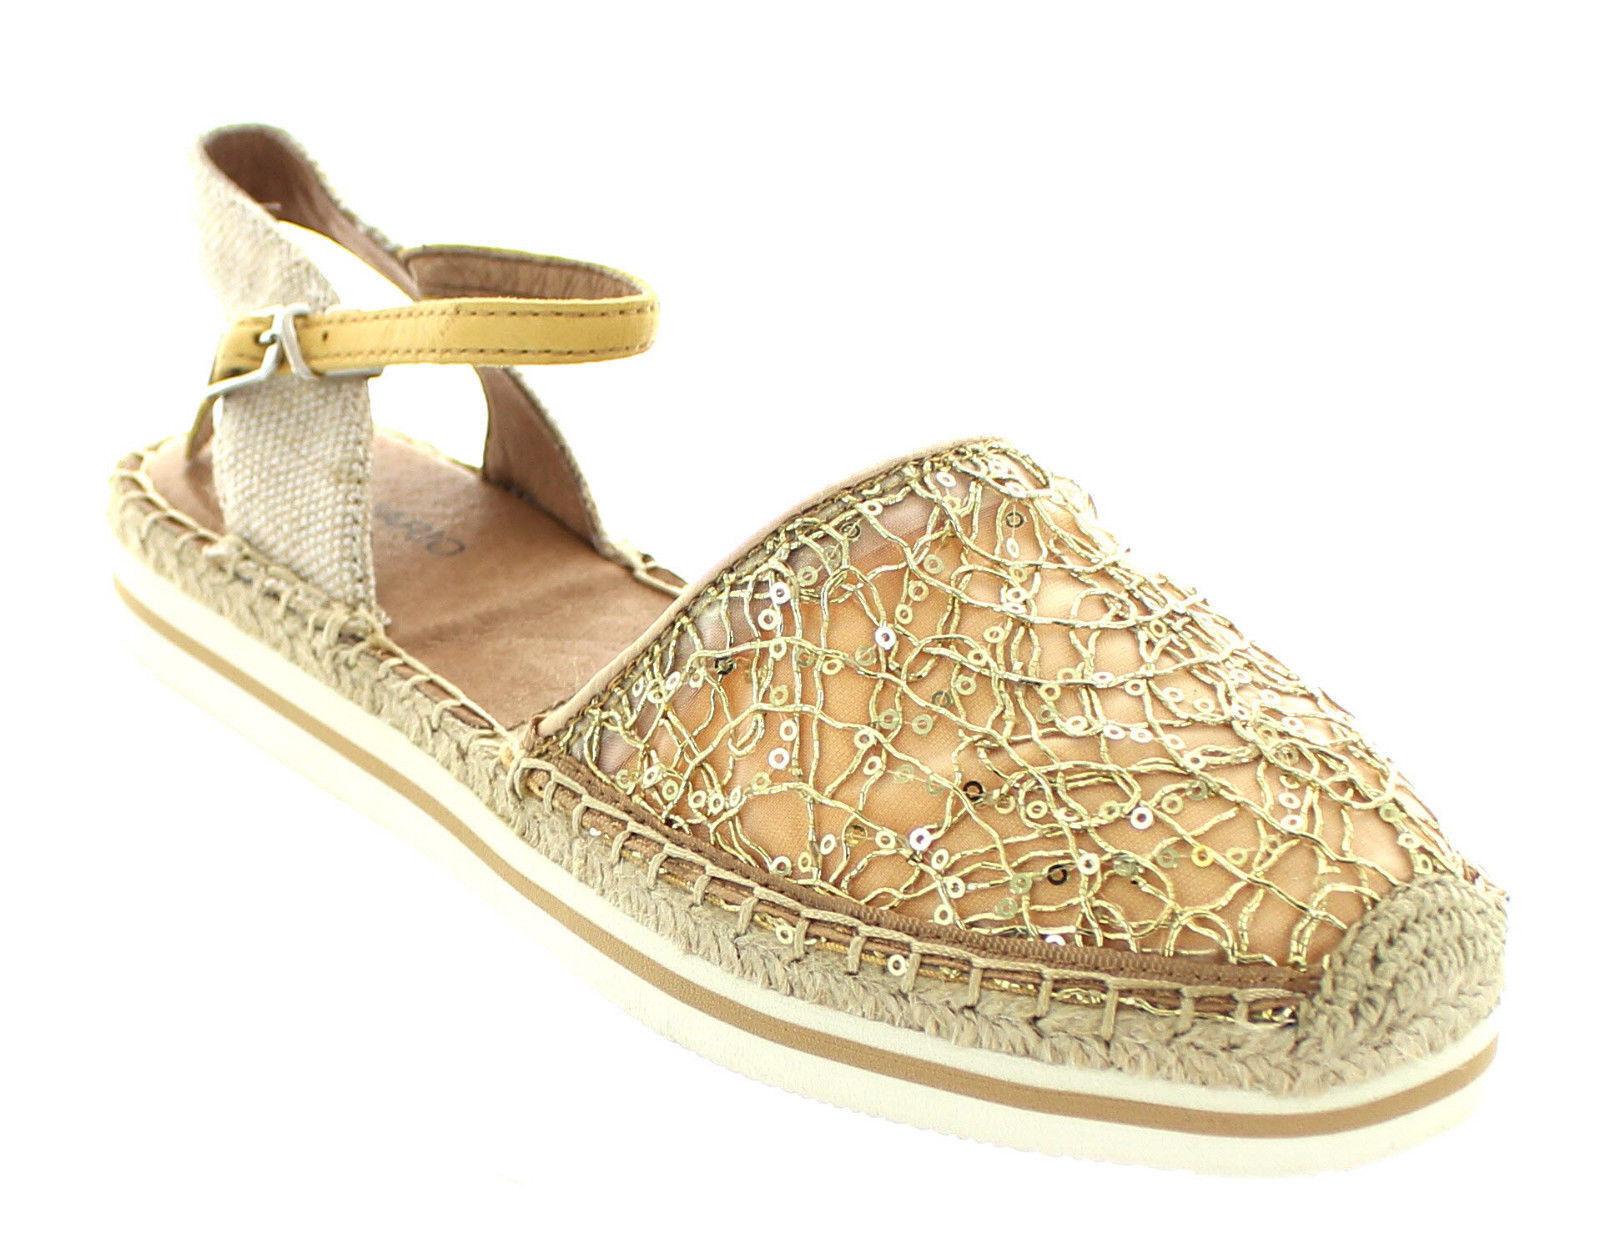 JOY & MARIO mujer rojoondo Sporty Samdals Samdals Samdals Slip-on Espadrille zapatos oro Flat  de moda